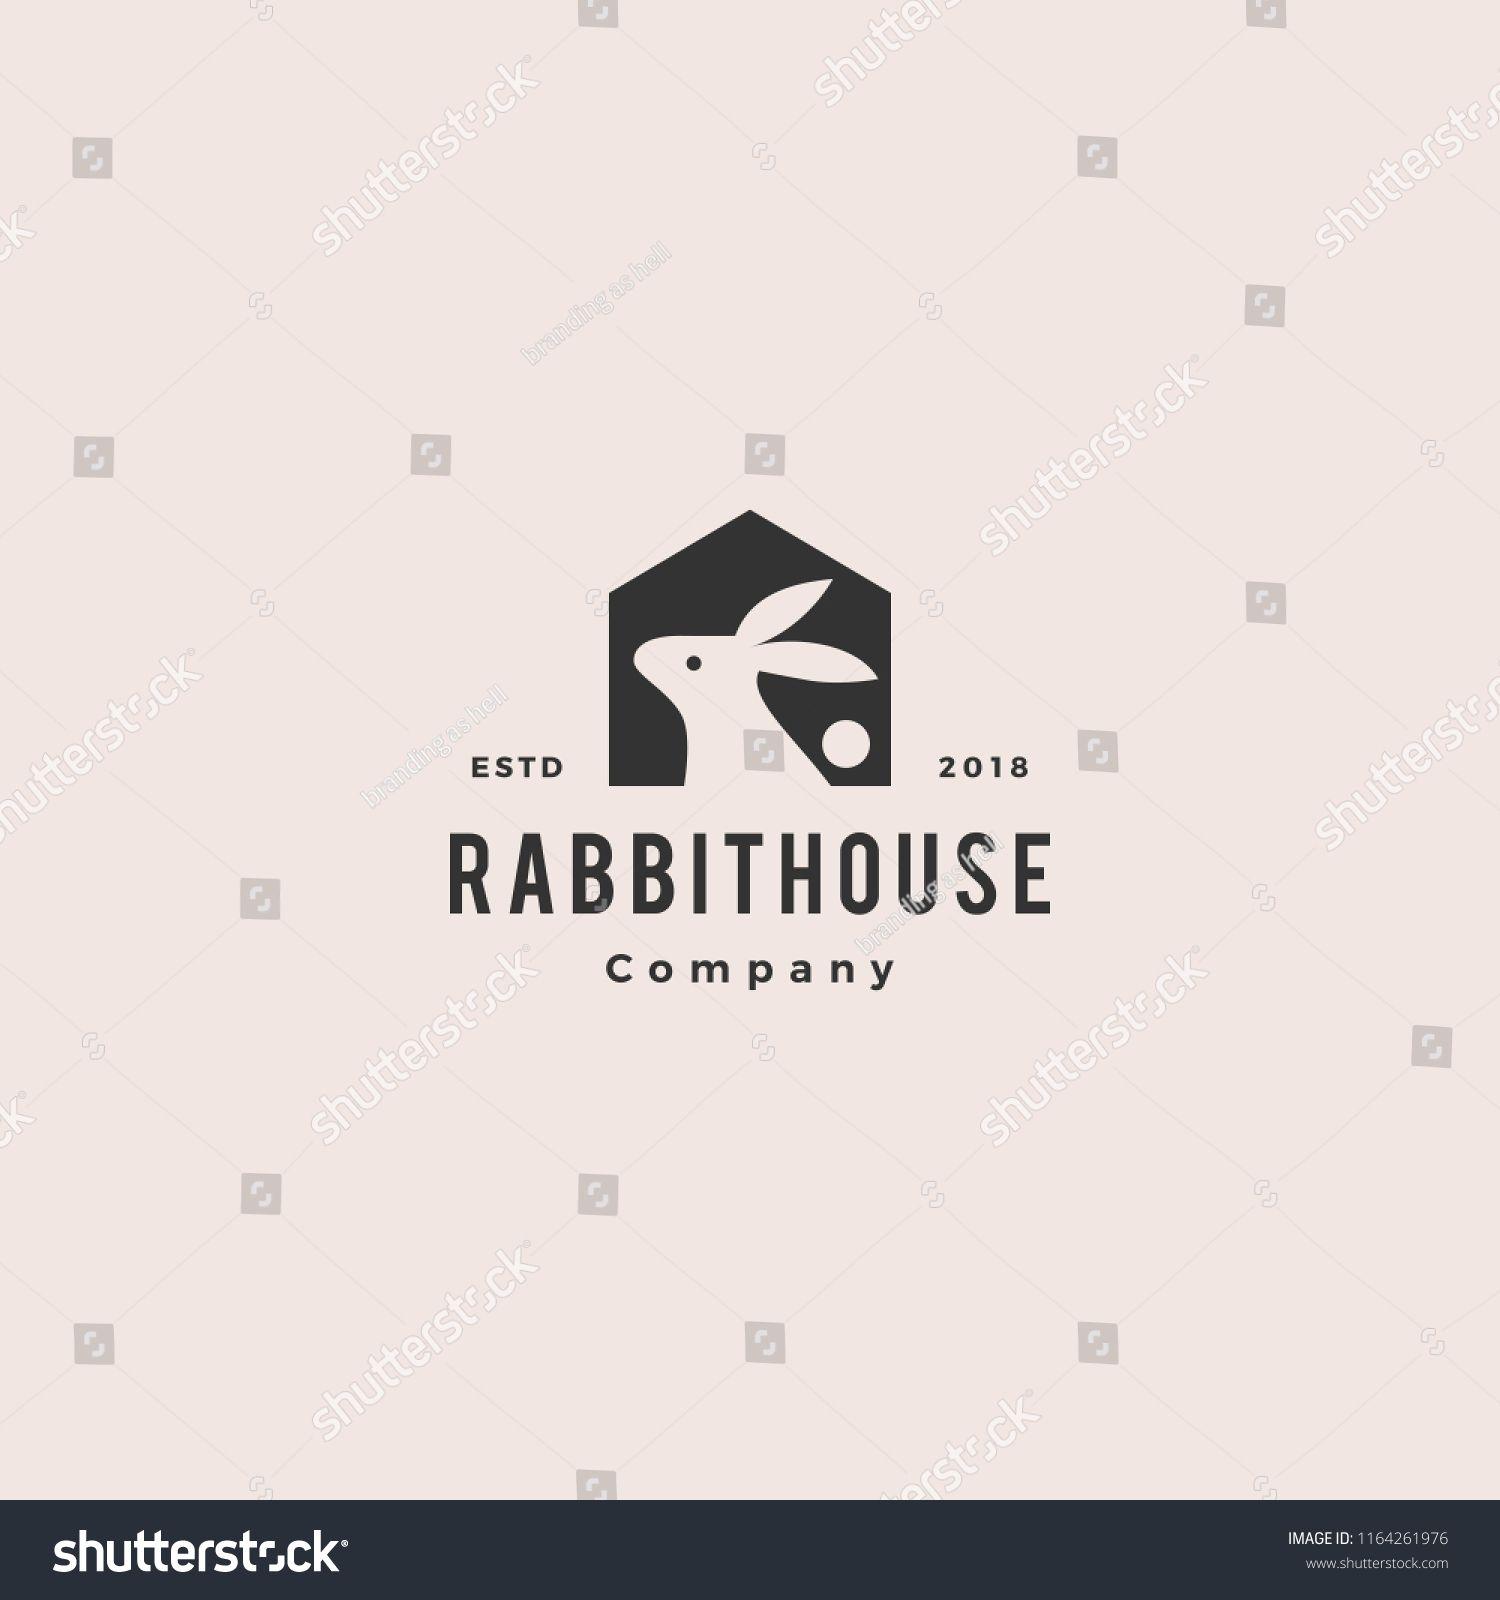 Rabbit House Home Logo Vintage Retro Hipster Vector Icon Illustration Logo House Estate Real Home Design Icon Building Business Vector Comp